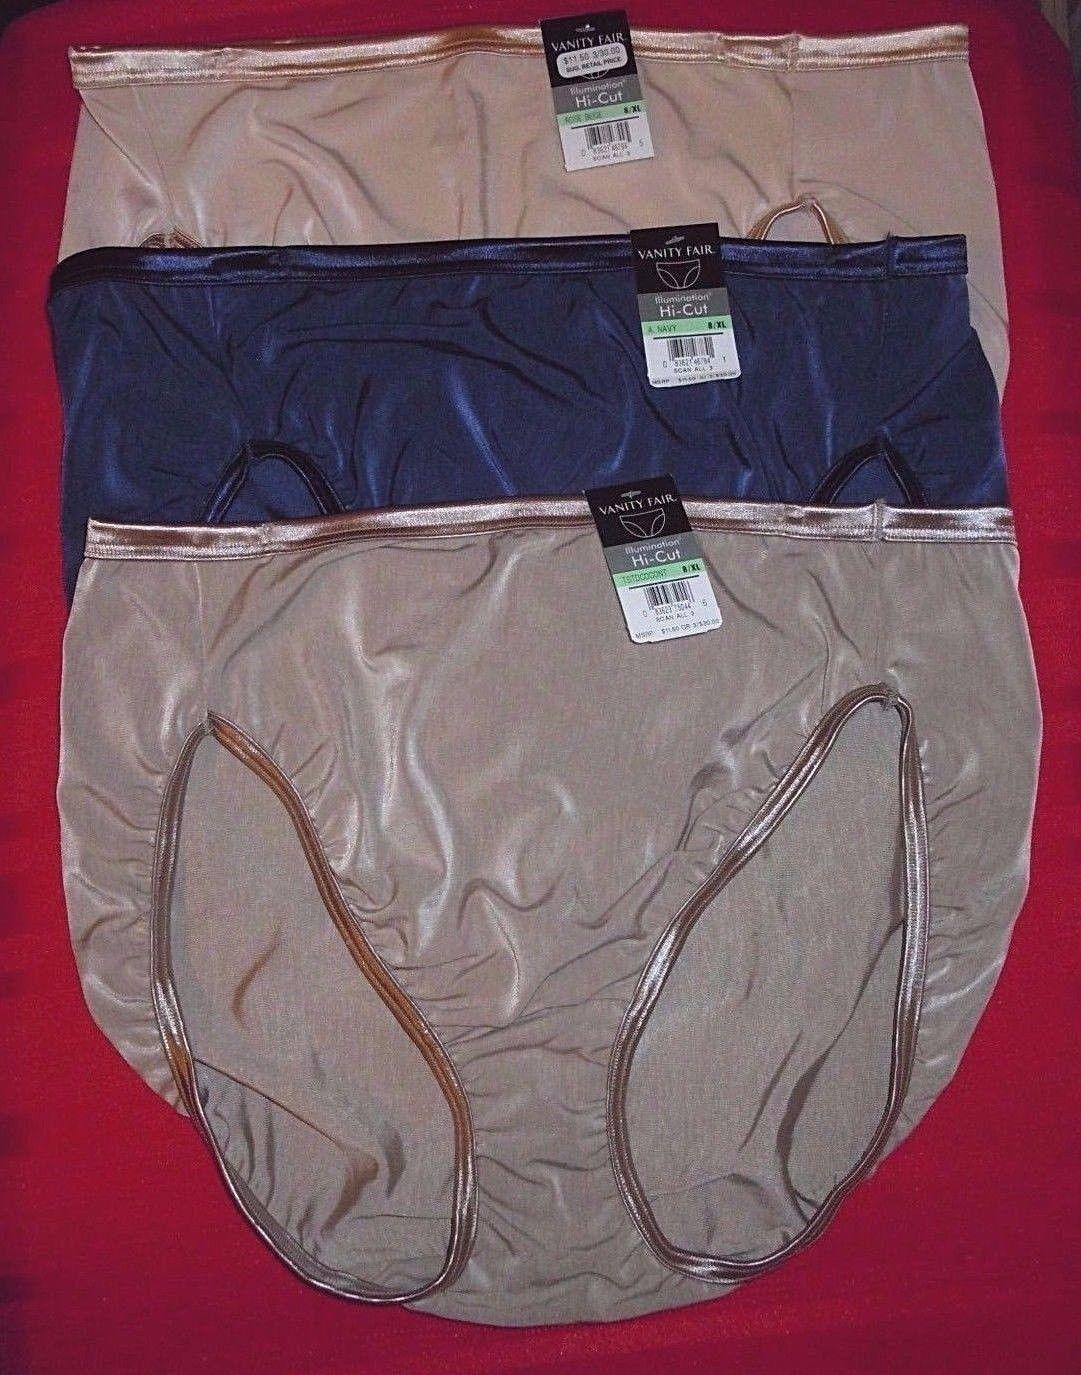 3 VANITY FAIR 8 XL Illumination Hi Cut Briefs Panties Beige Blue 13108  Underwear